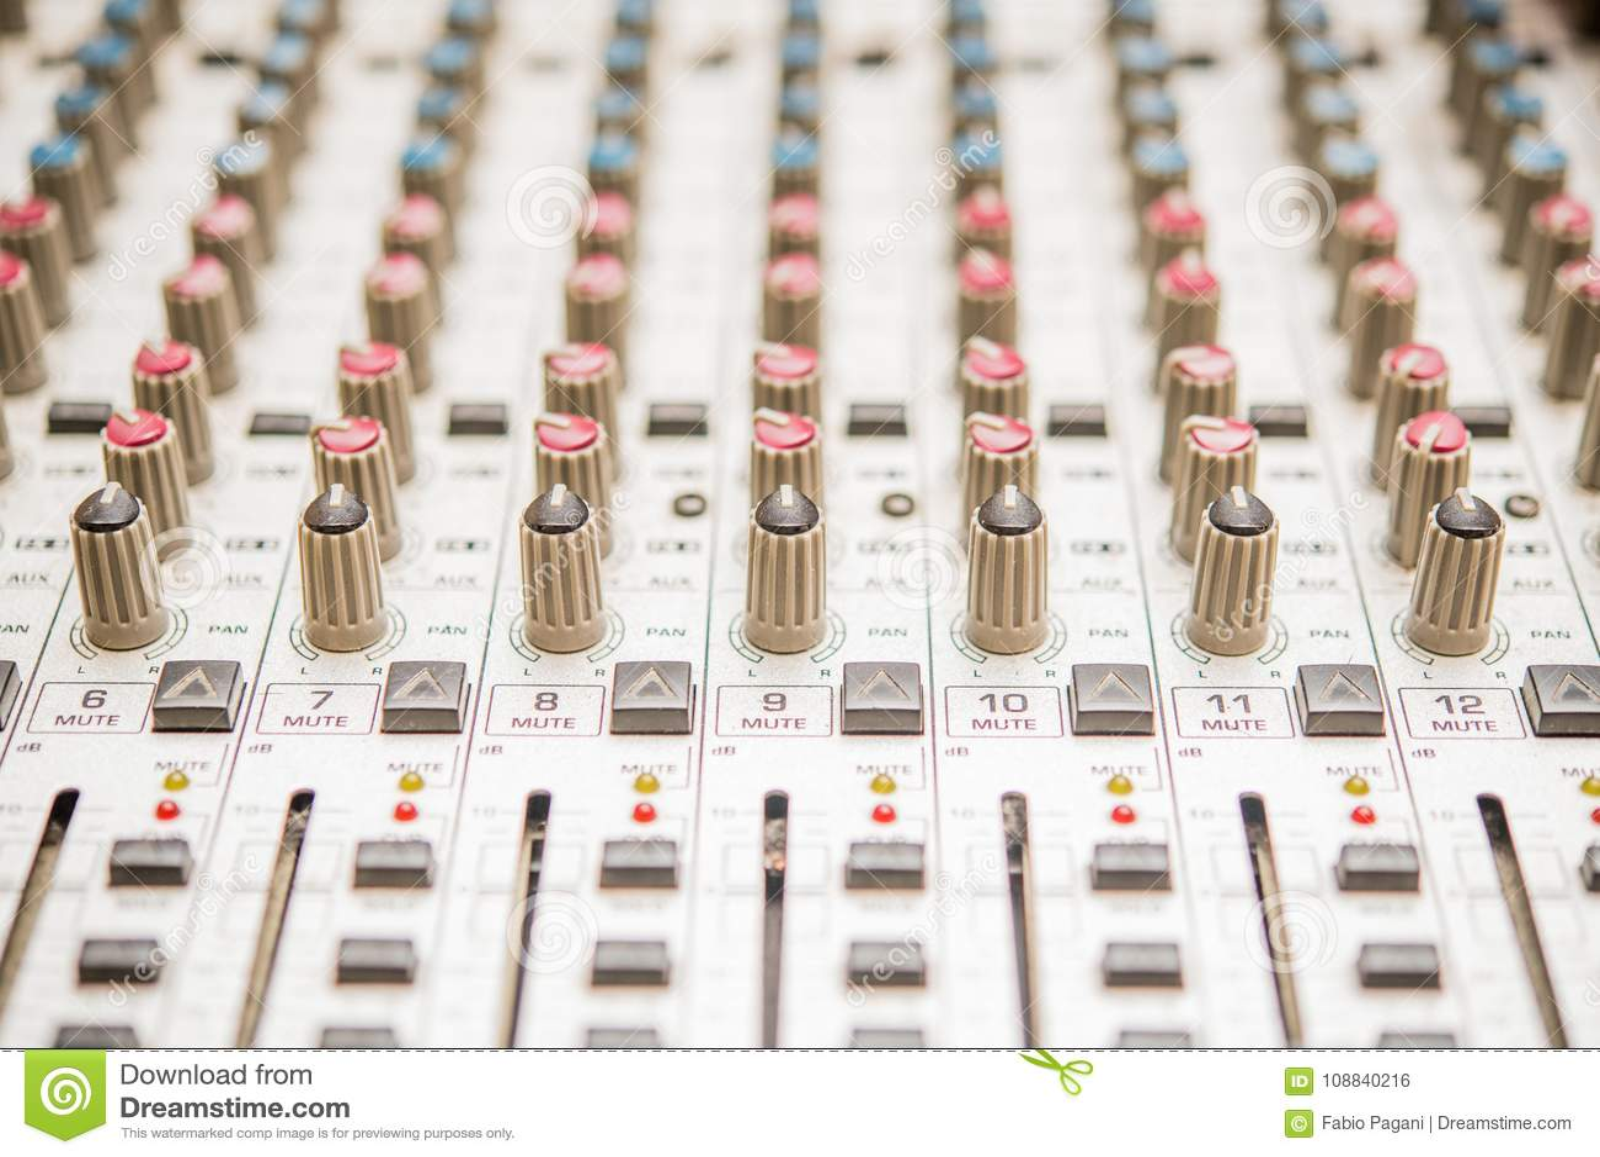 controls detail on recording audio mixer stock photo image of